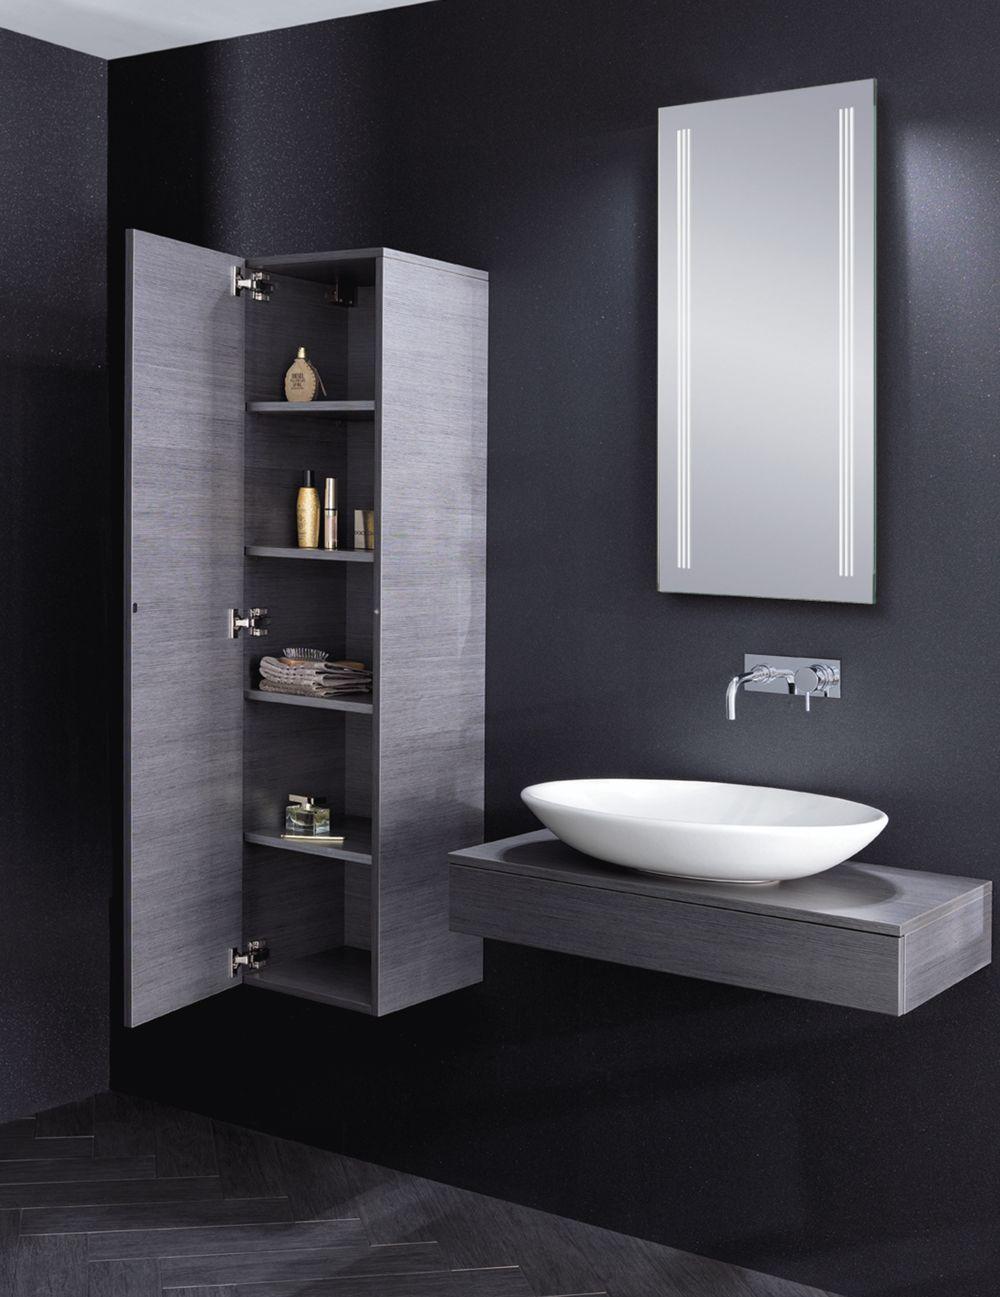 Bauhaus Countertop Wall Hung Vanity Basin Edge In Steel With Matching Bathroom Storage Cabinet Modernes Badezimmerdesign Bauhaus Mobel Modernes Badezimmer